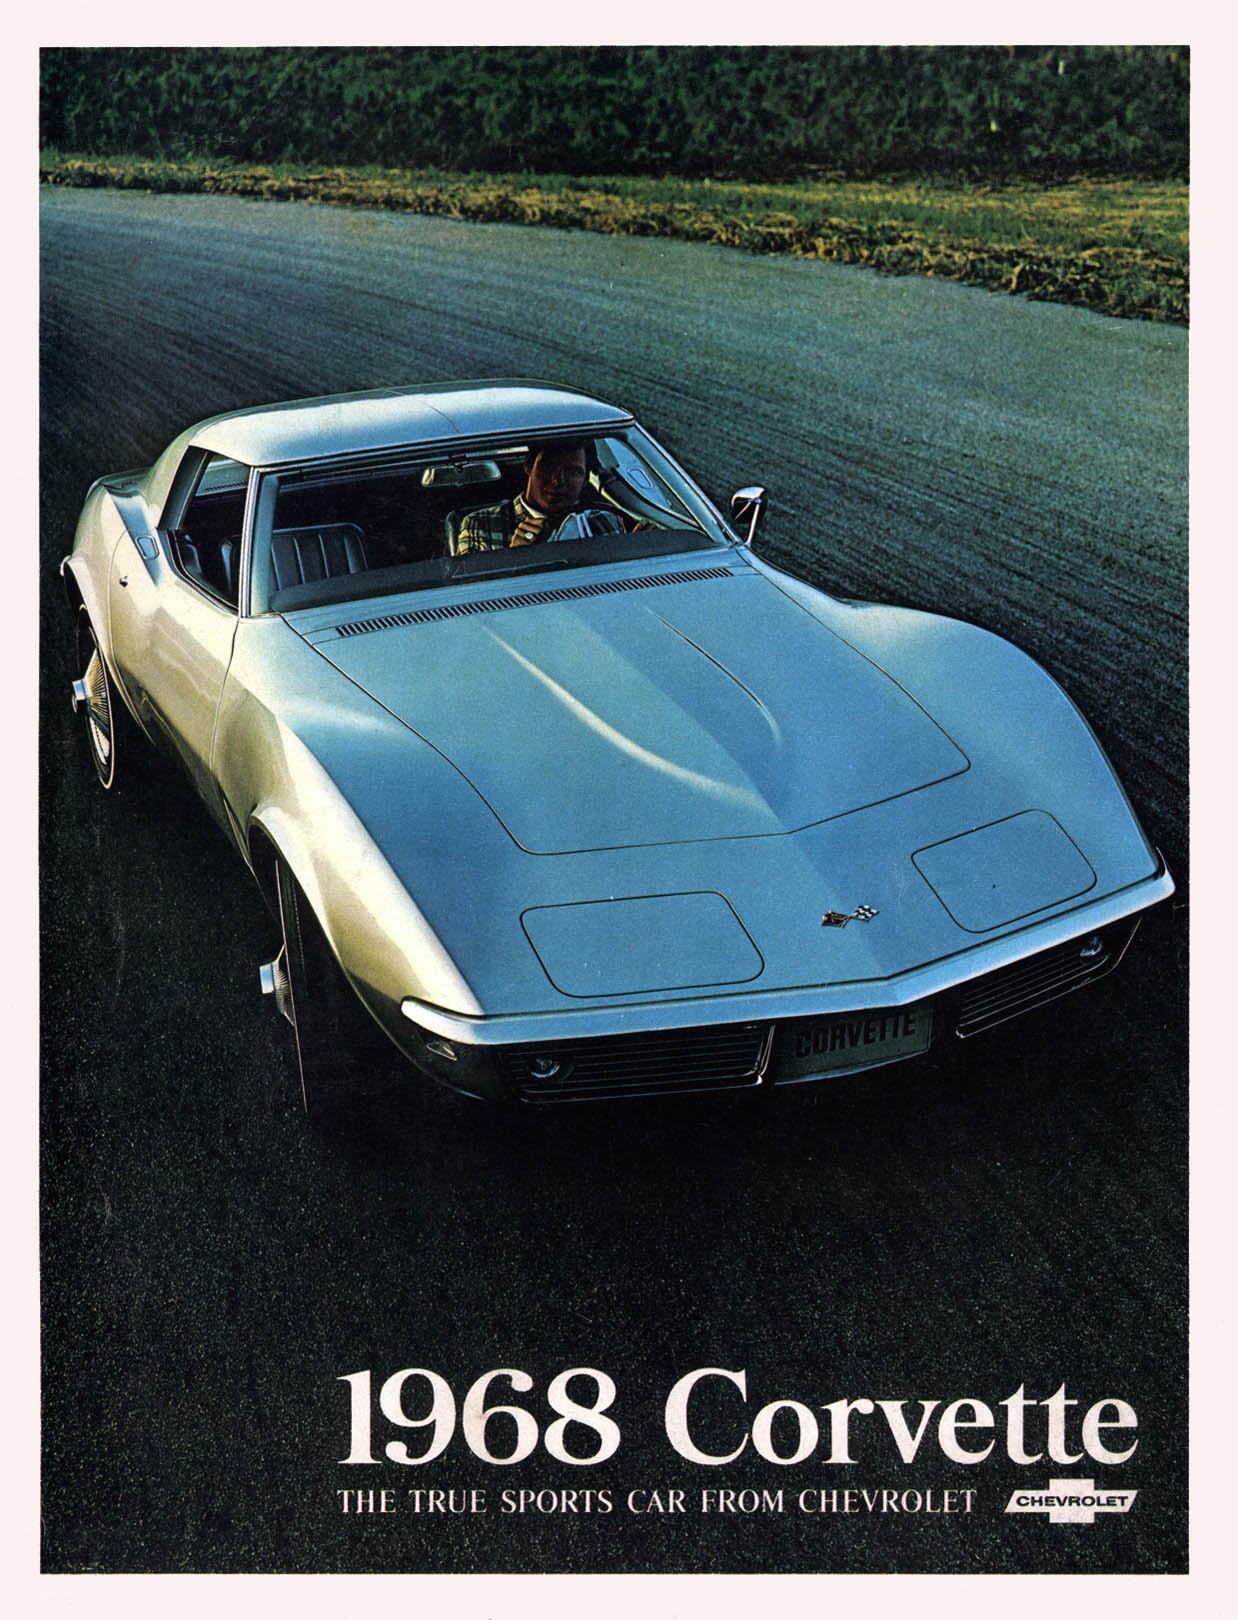 1968 Chevrolet Corvette Brochure Project Car